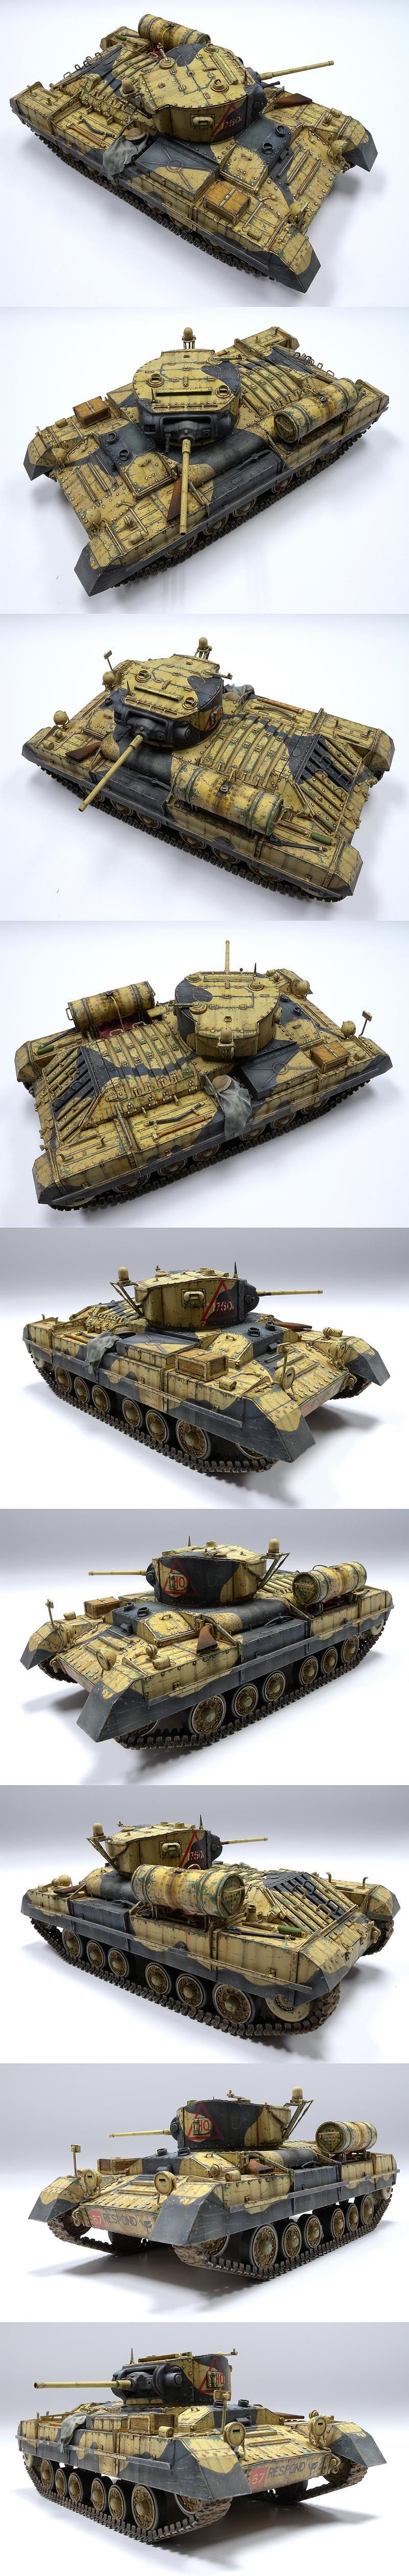 Valentine II 1/35 Scale Model